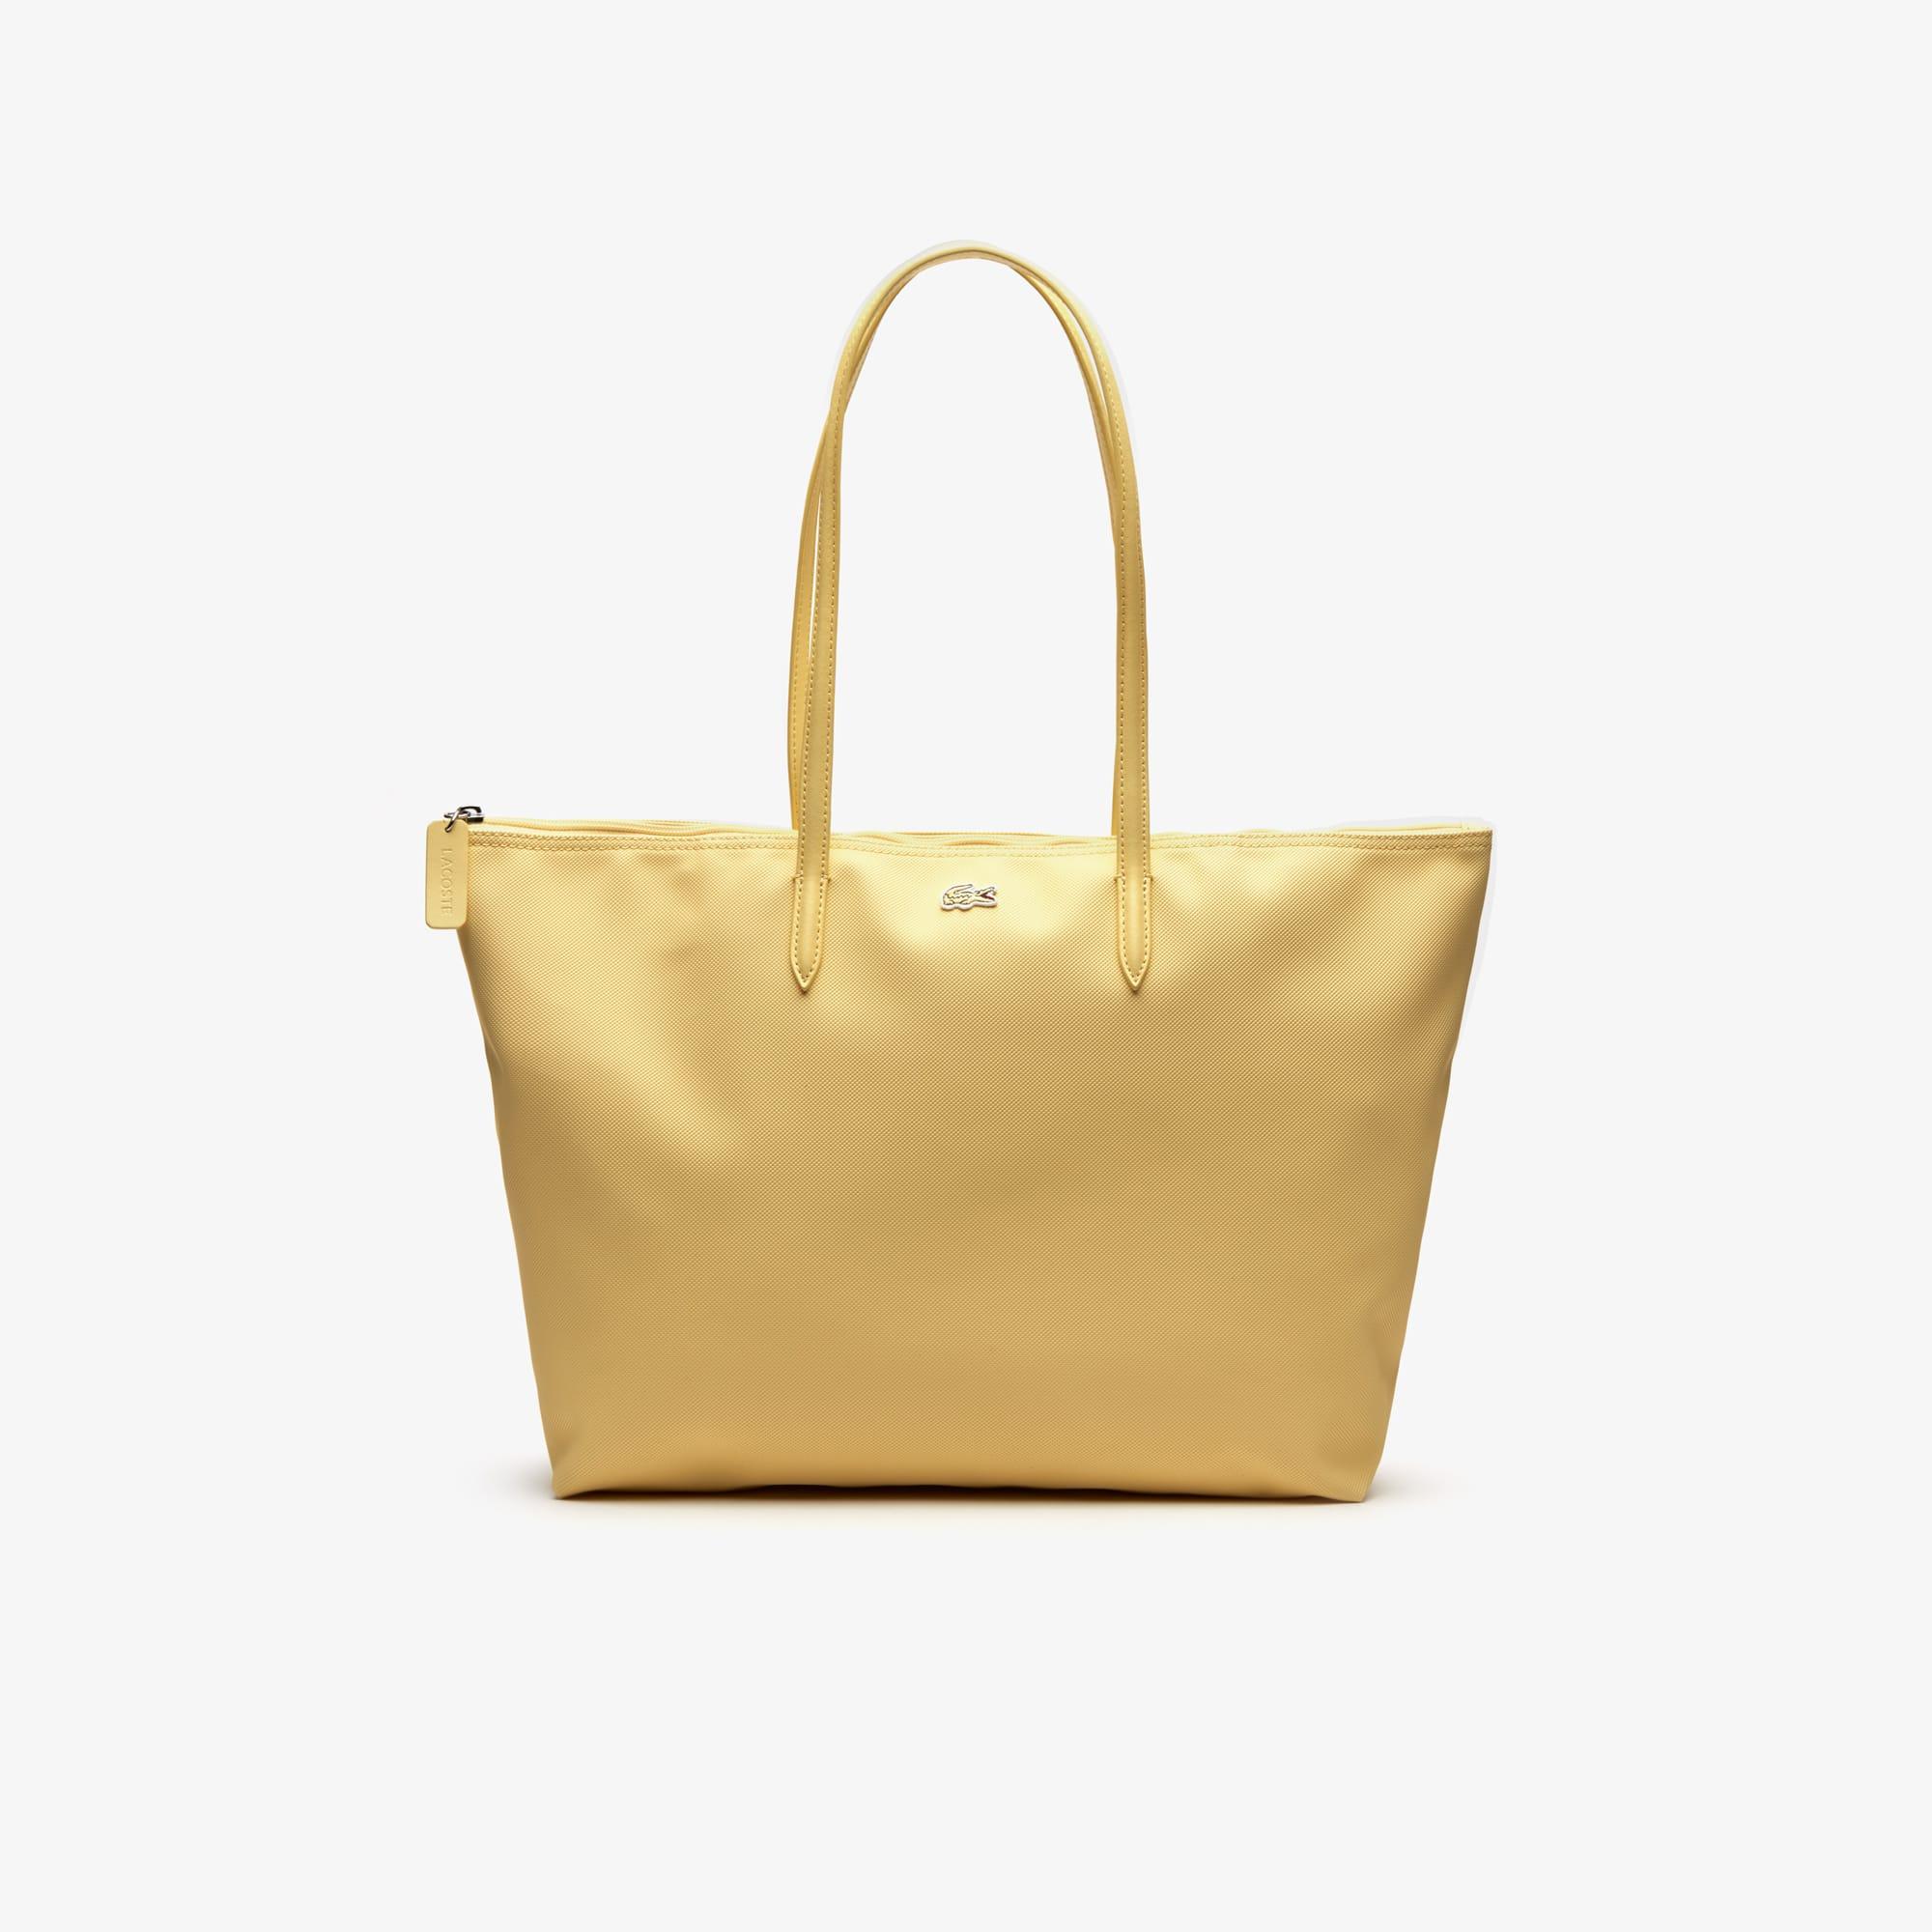 309994b52415f حقيبة يد نسائية بسحاب من مجموعة L.12.12 Concept